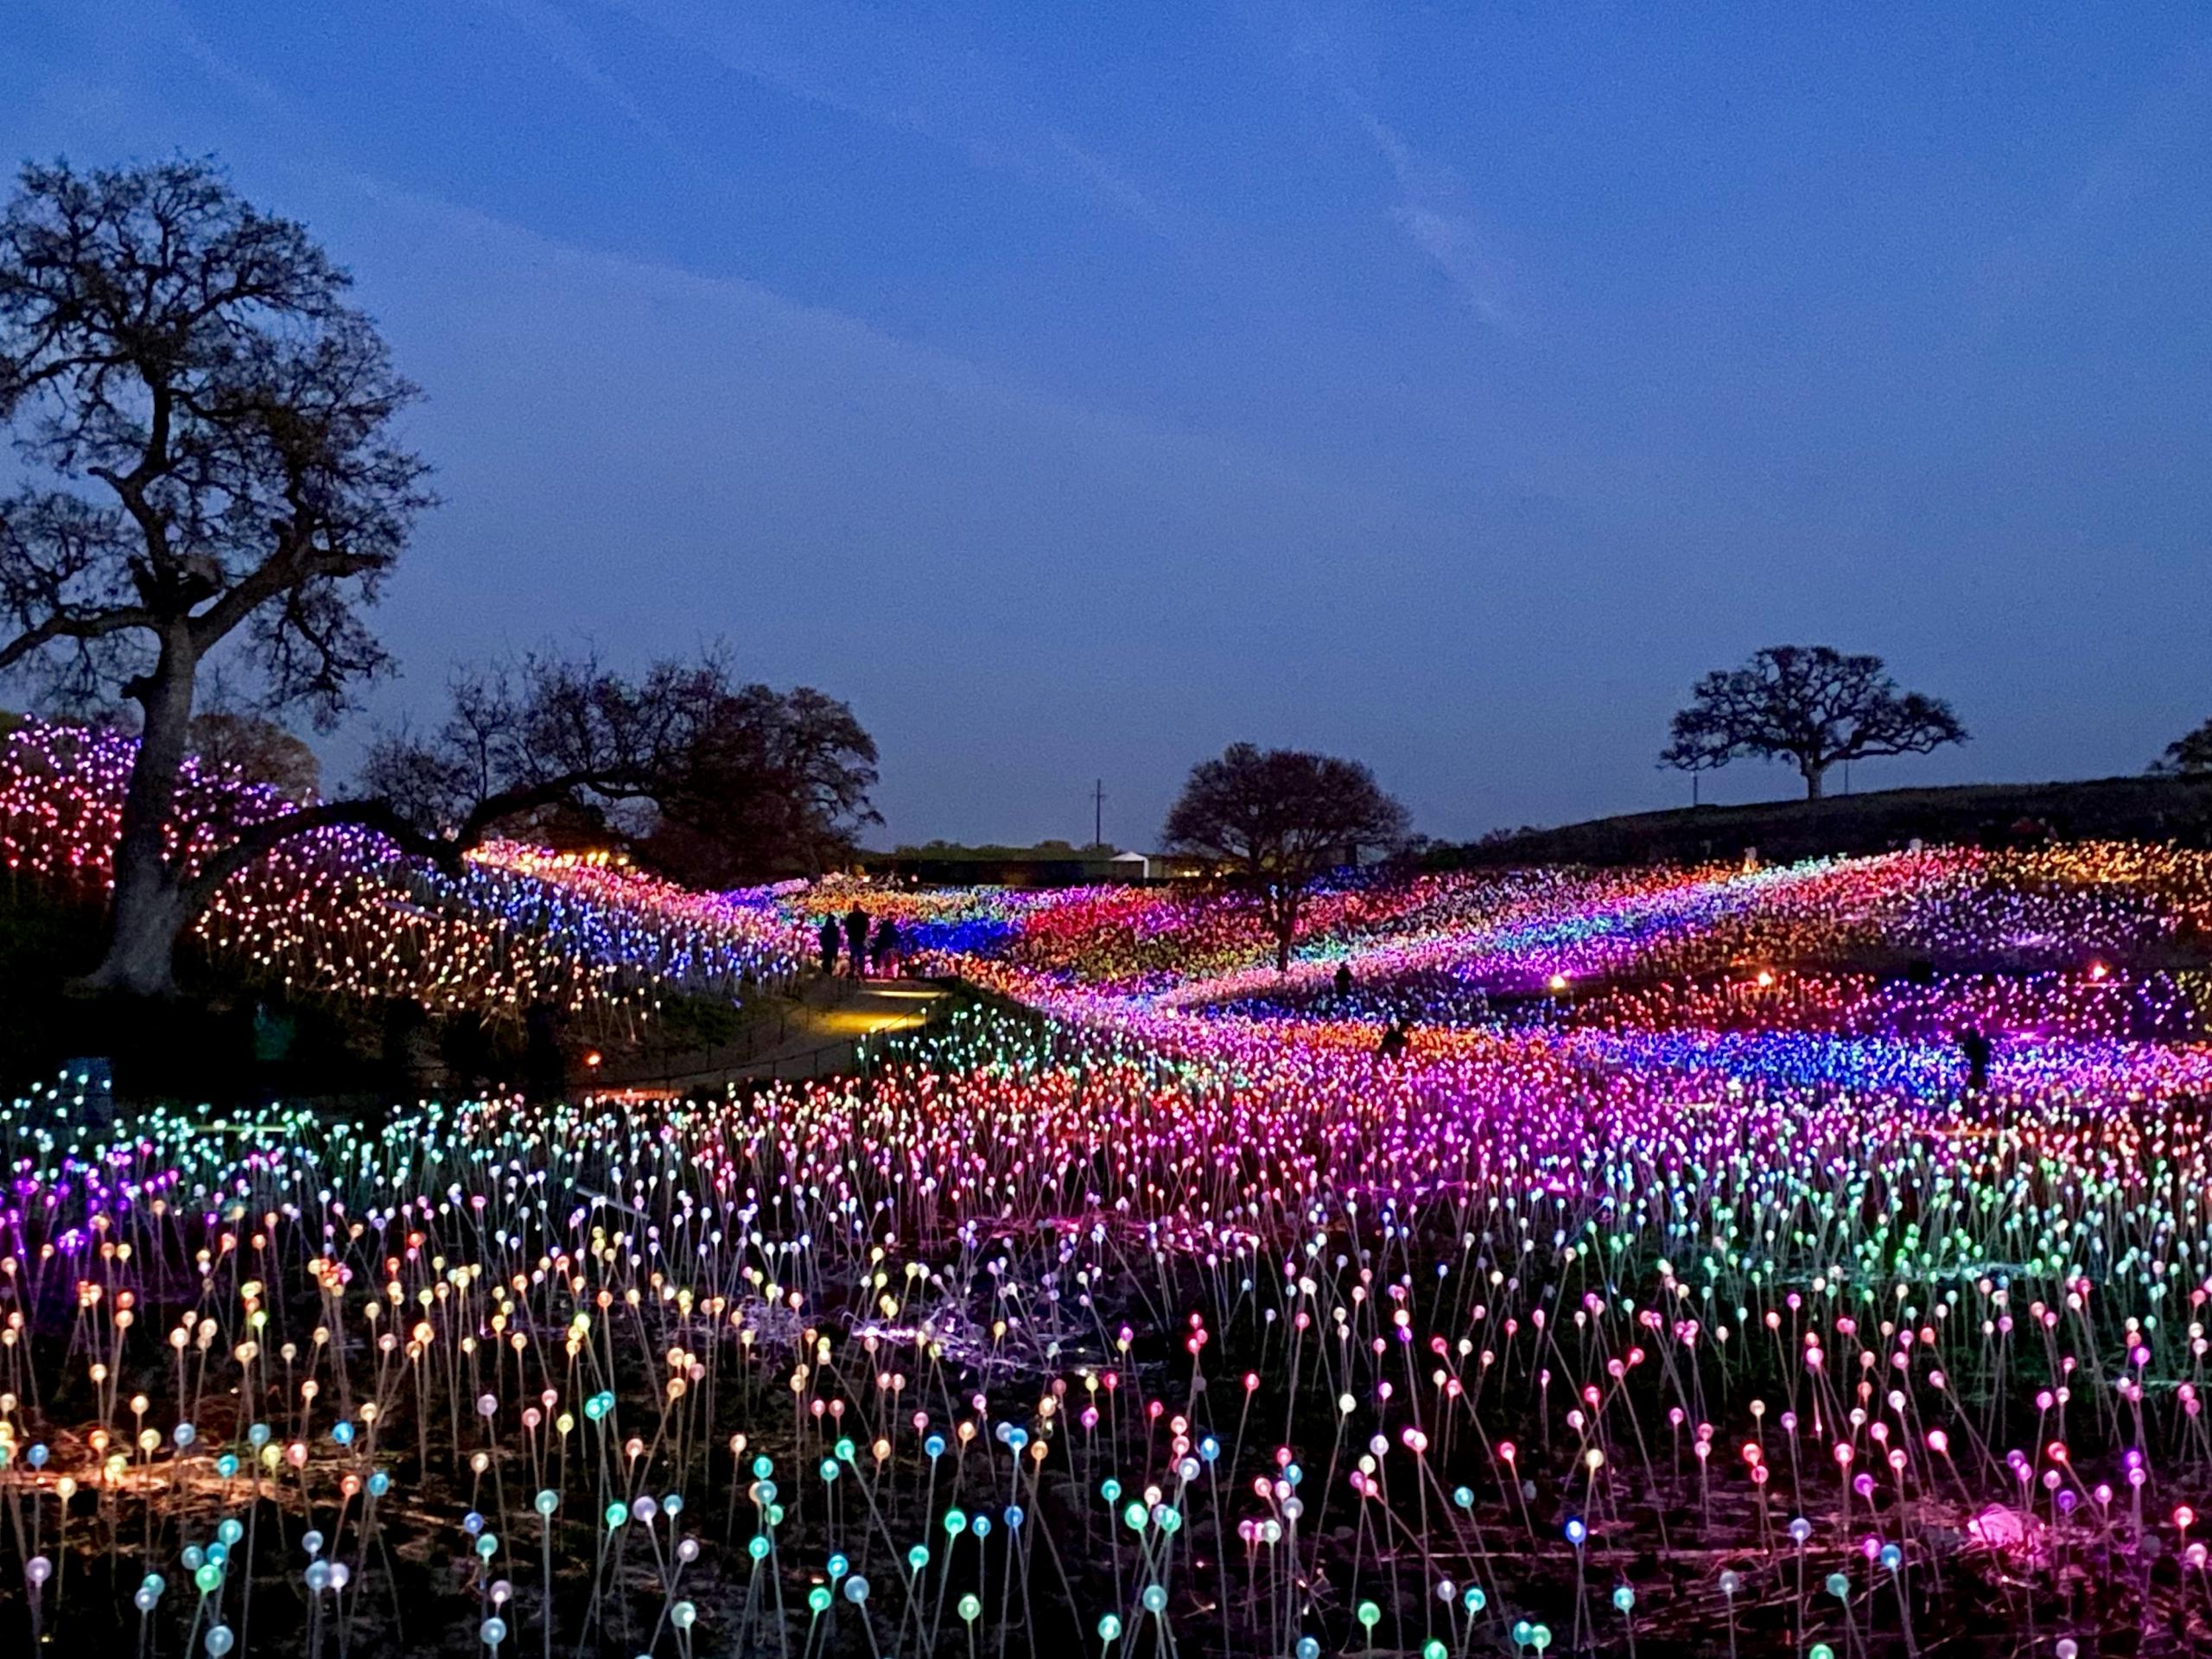 bruce munro Field of Light